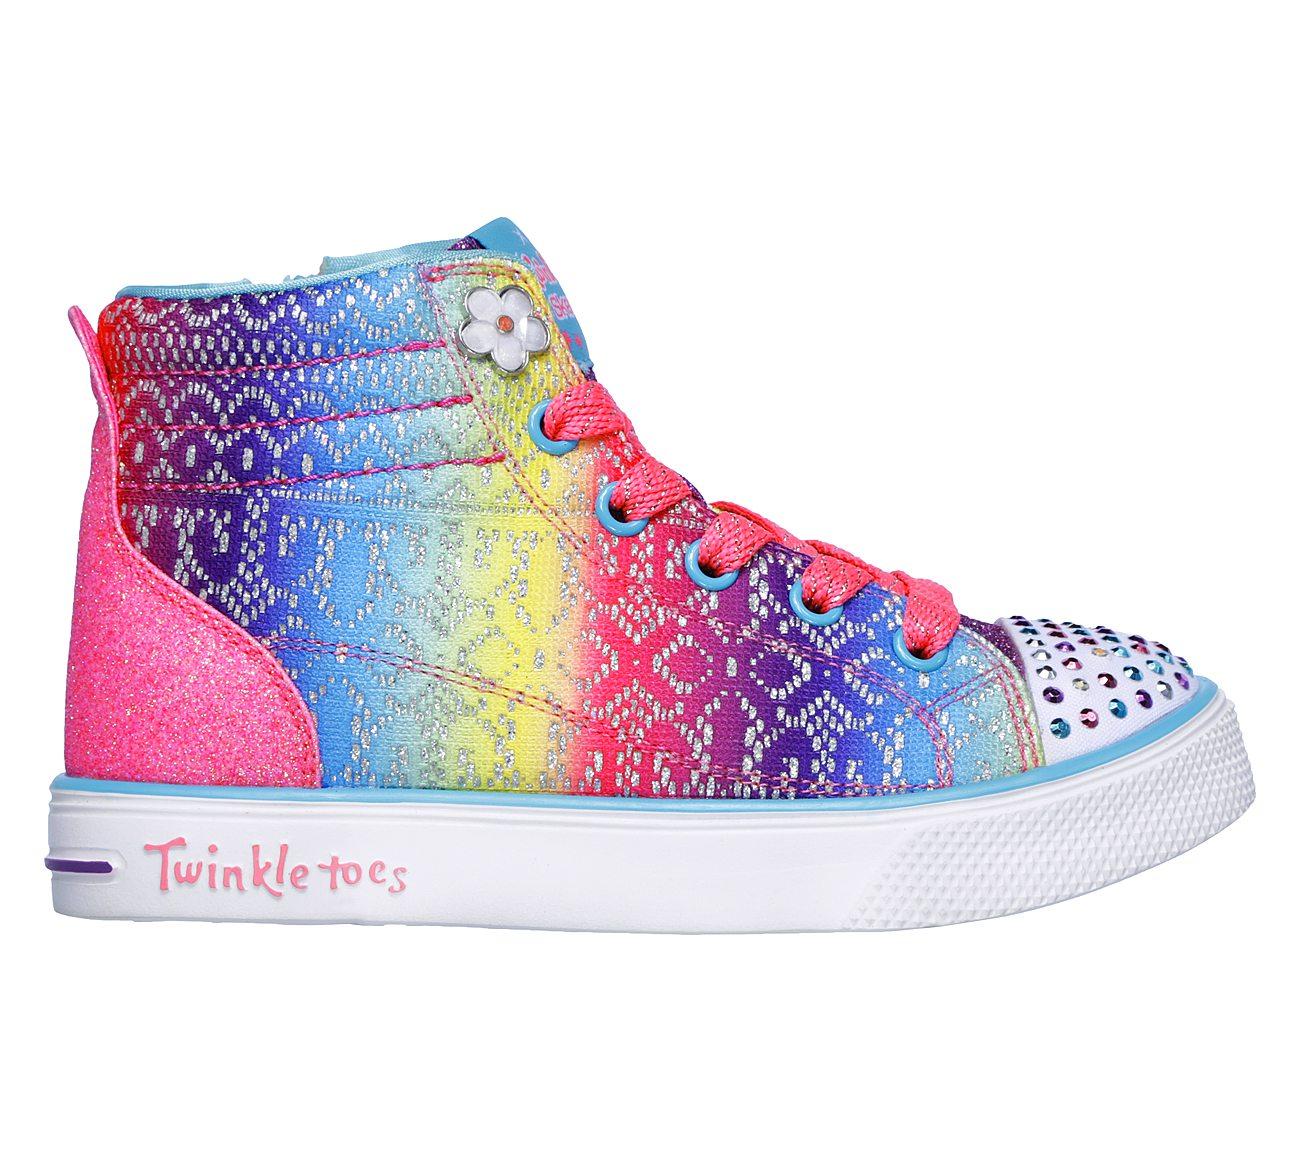 Twinkle Toes: Twinkle Breeze 2.0 Rainbow Glitz